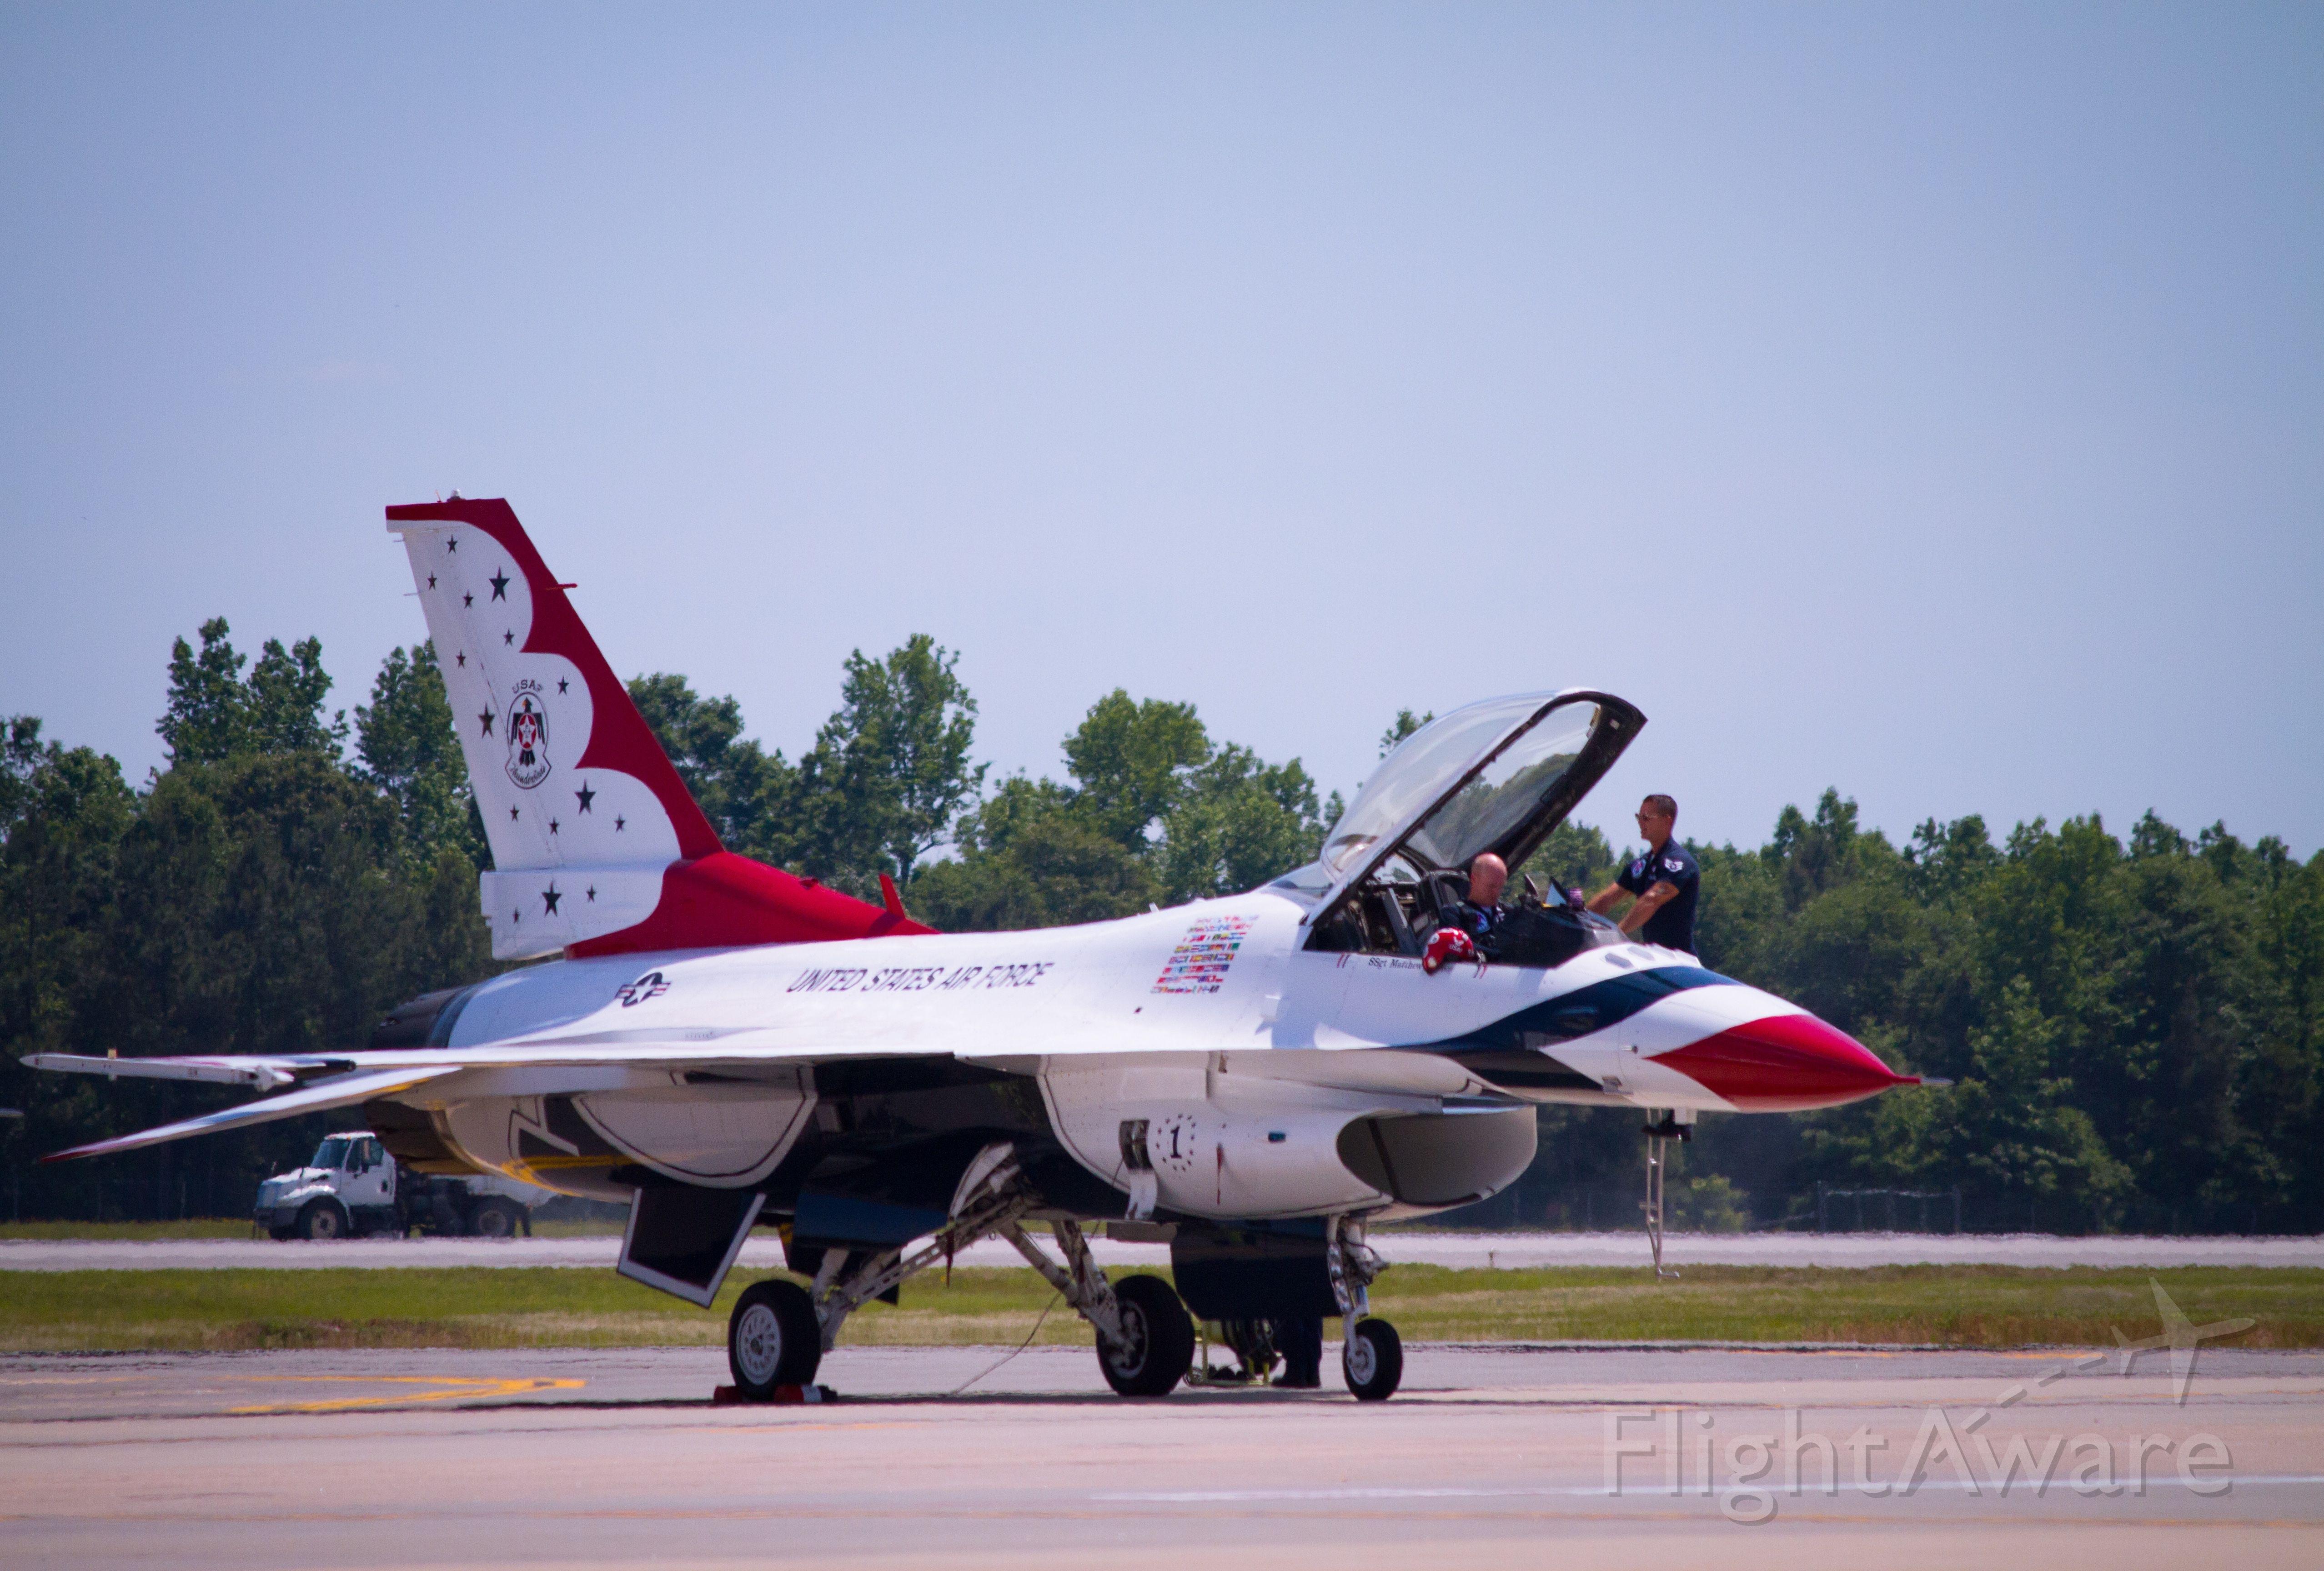 Lockheed F-16 Fighting Falcon — - Thunderbird 1 pre-flight at Seymour Johnson AFB, June 2015